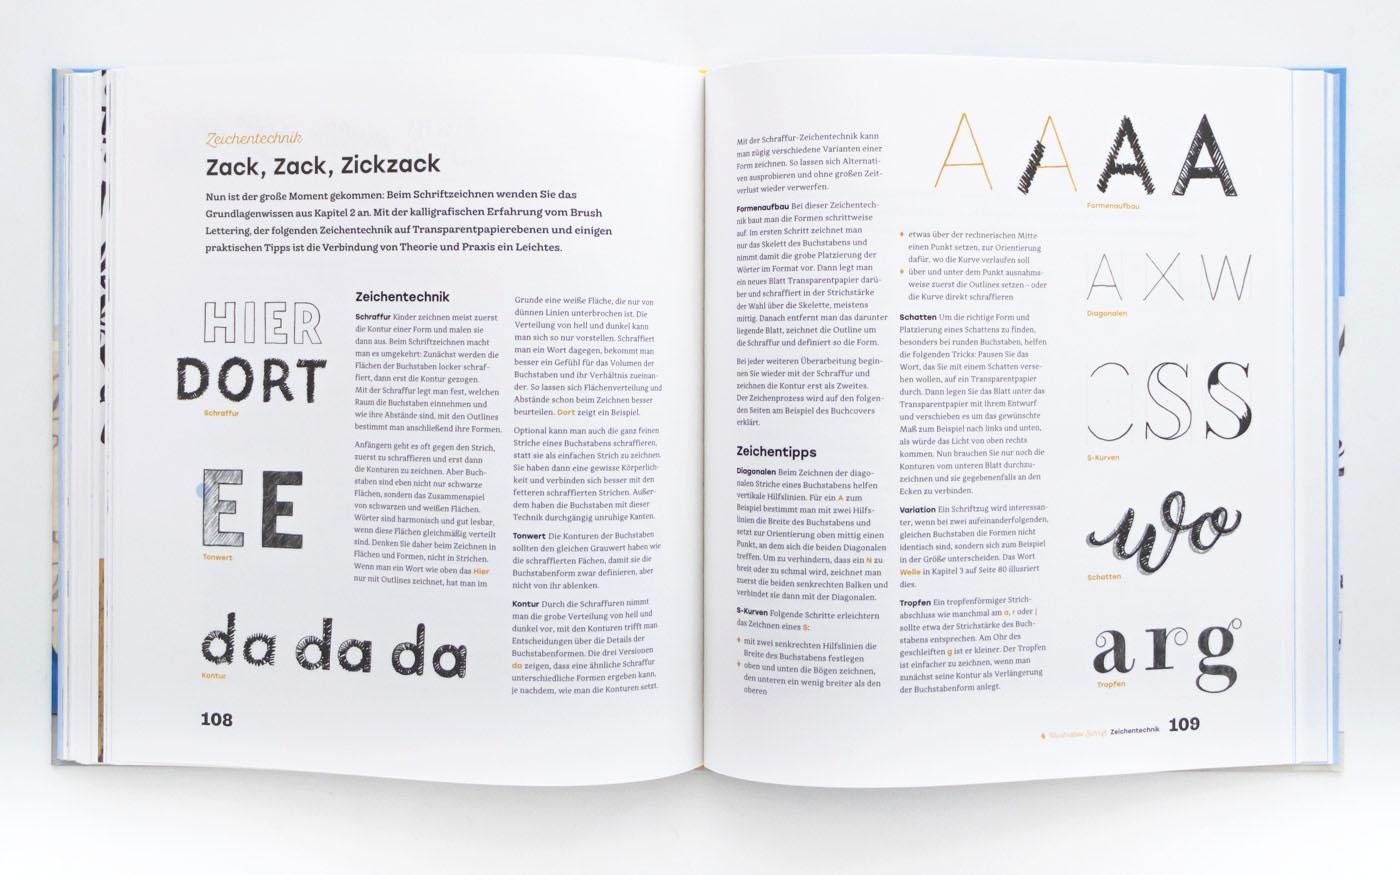 Campe_Handbuch-Handlettering_978-3-258-60165-6_-16.jpg